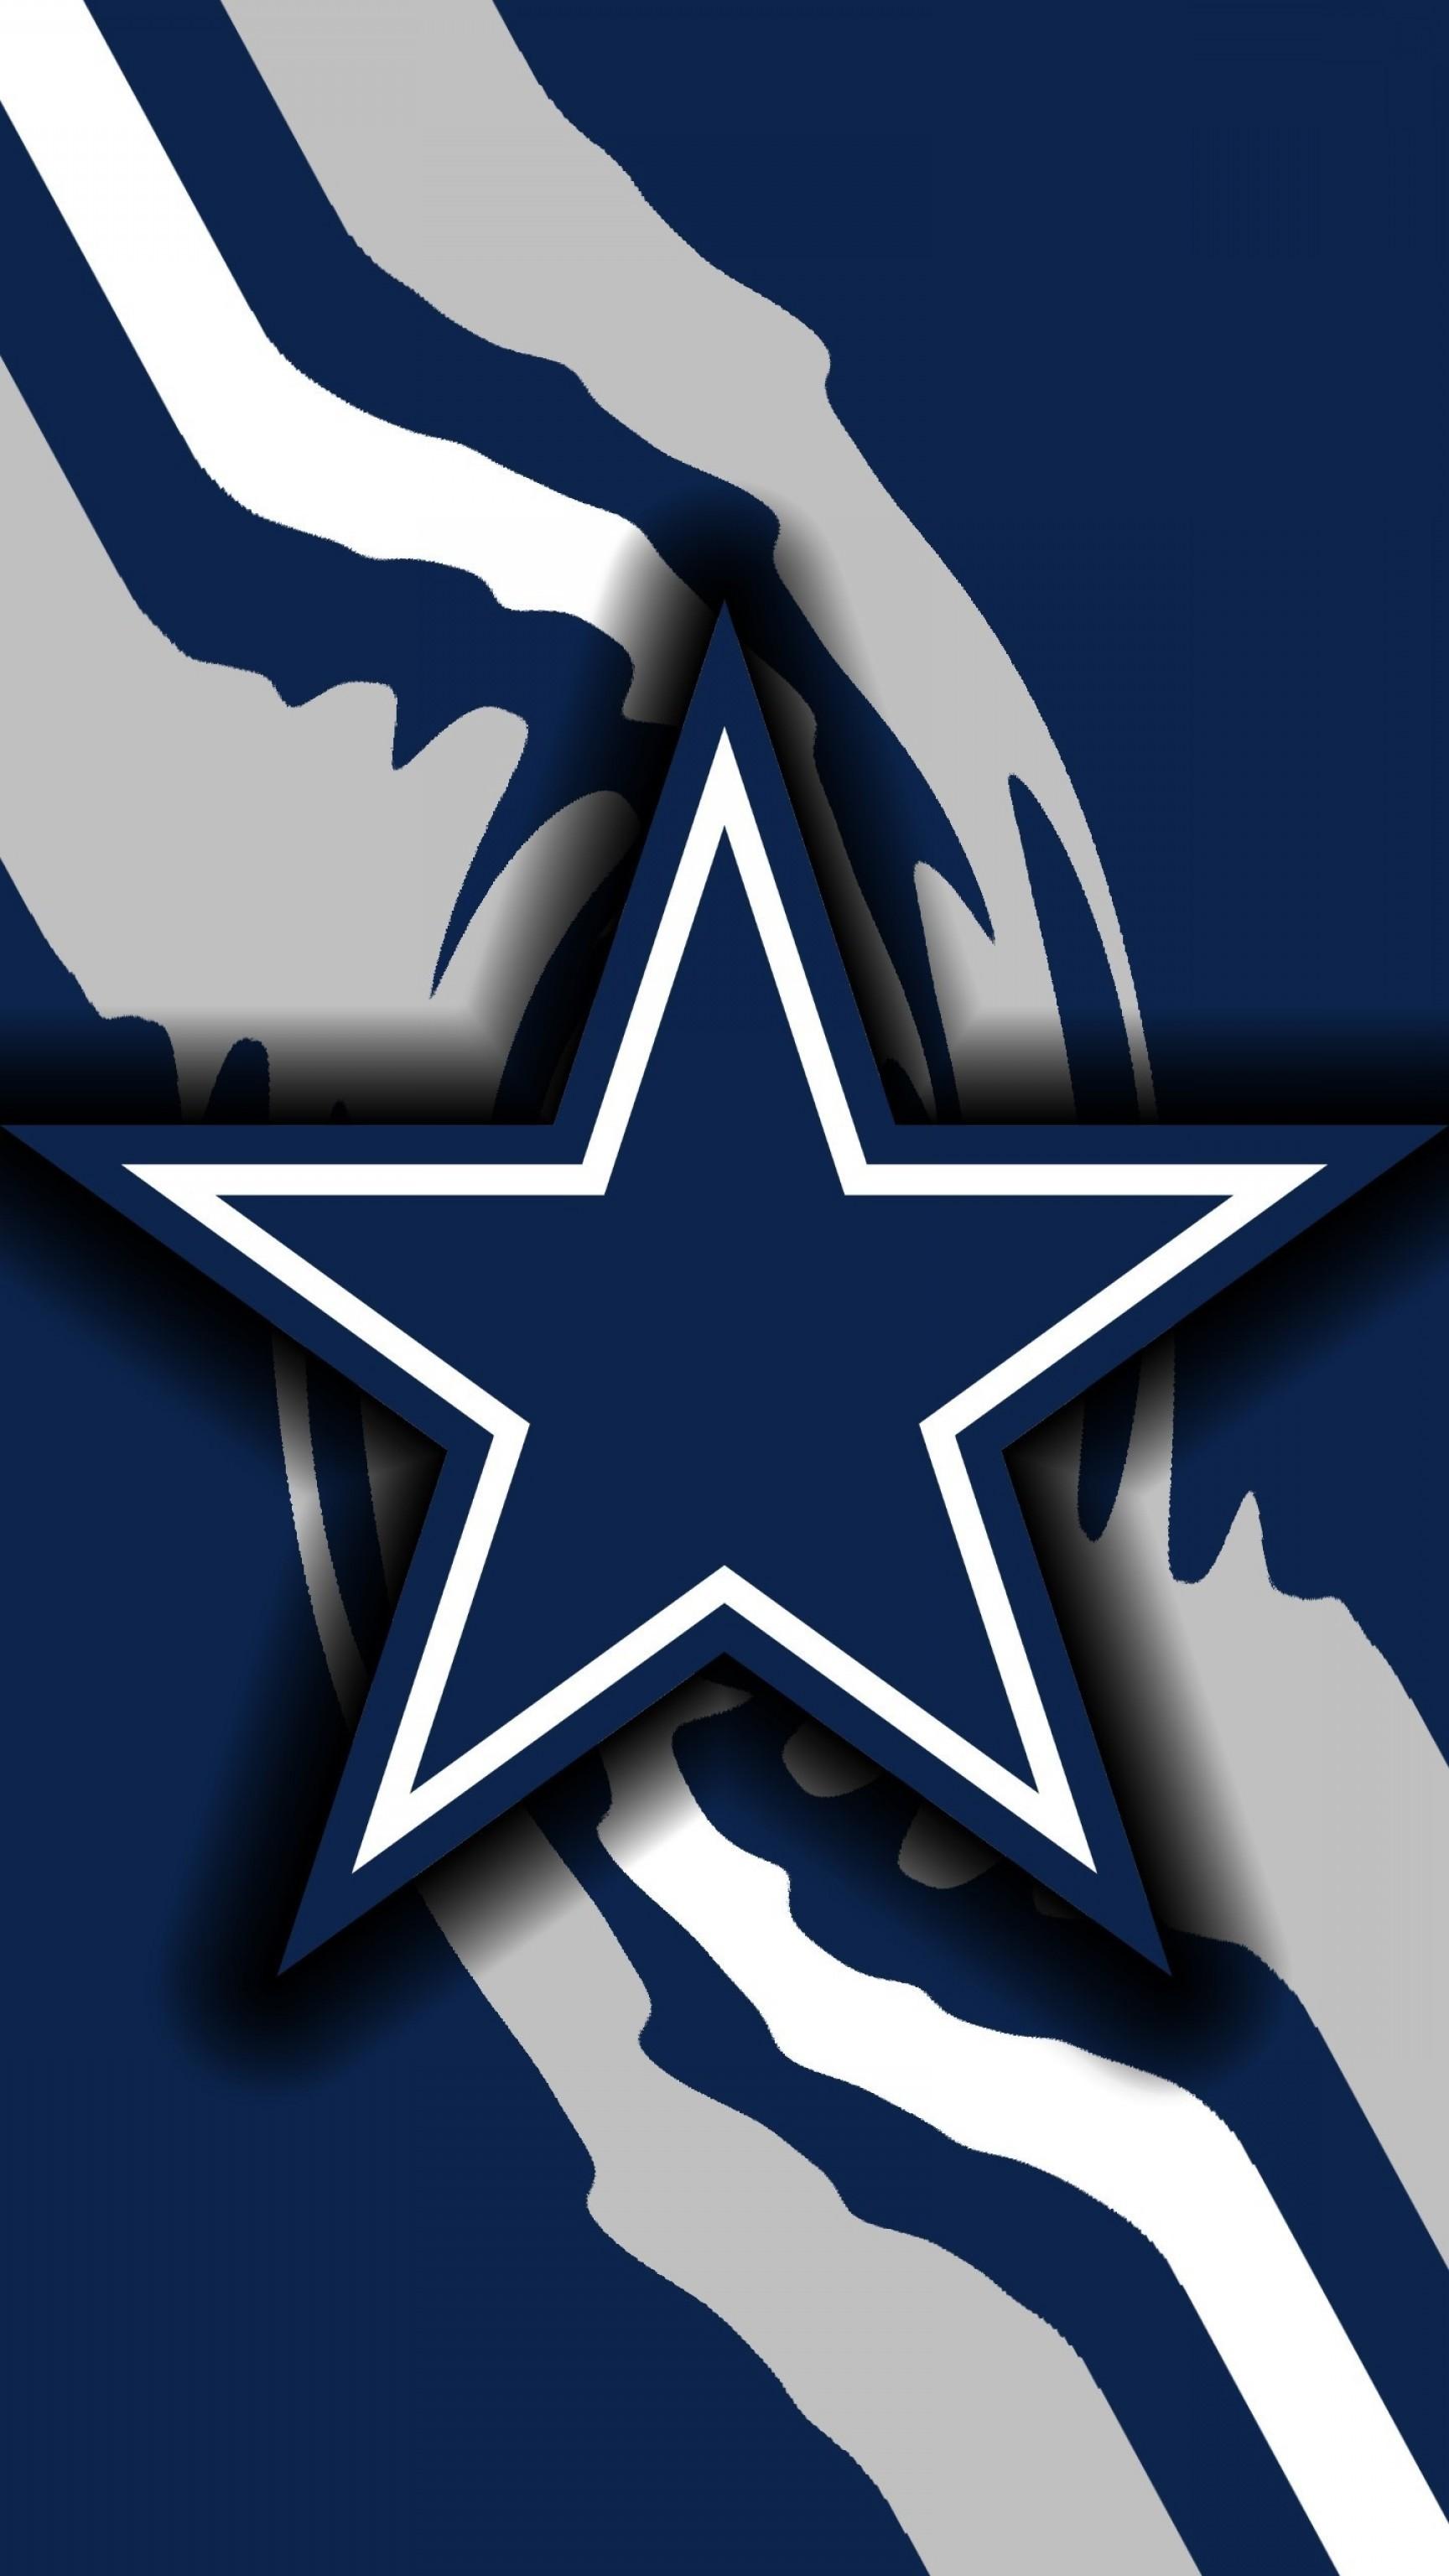 Dallas Cowboys Halloween Wallpaper (68+ images)